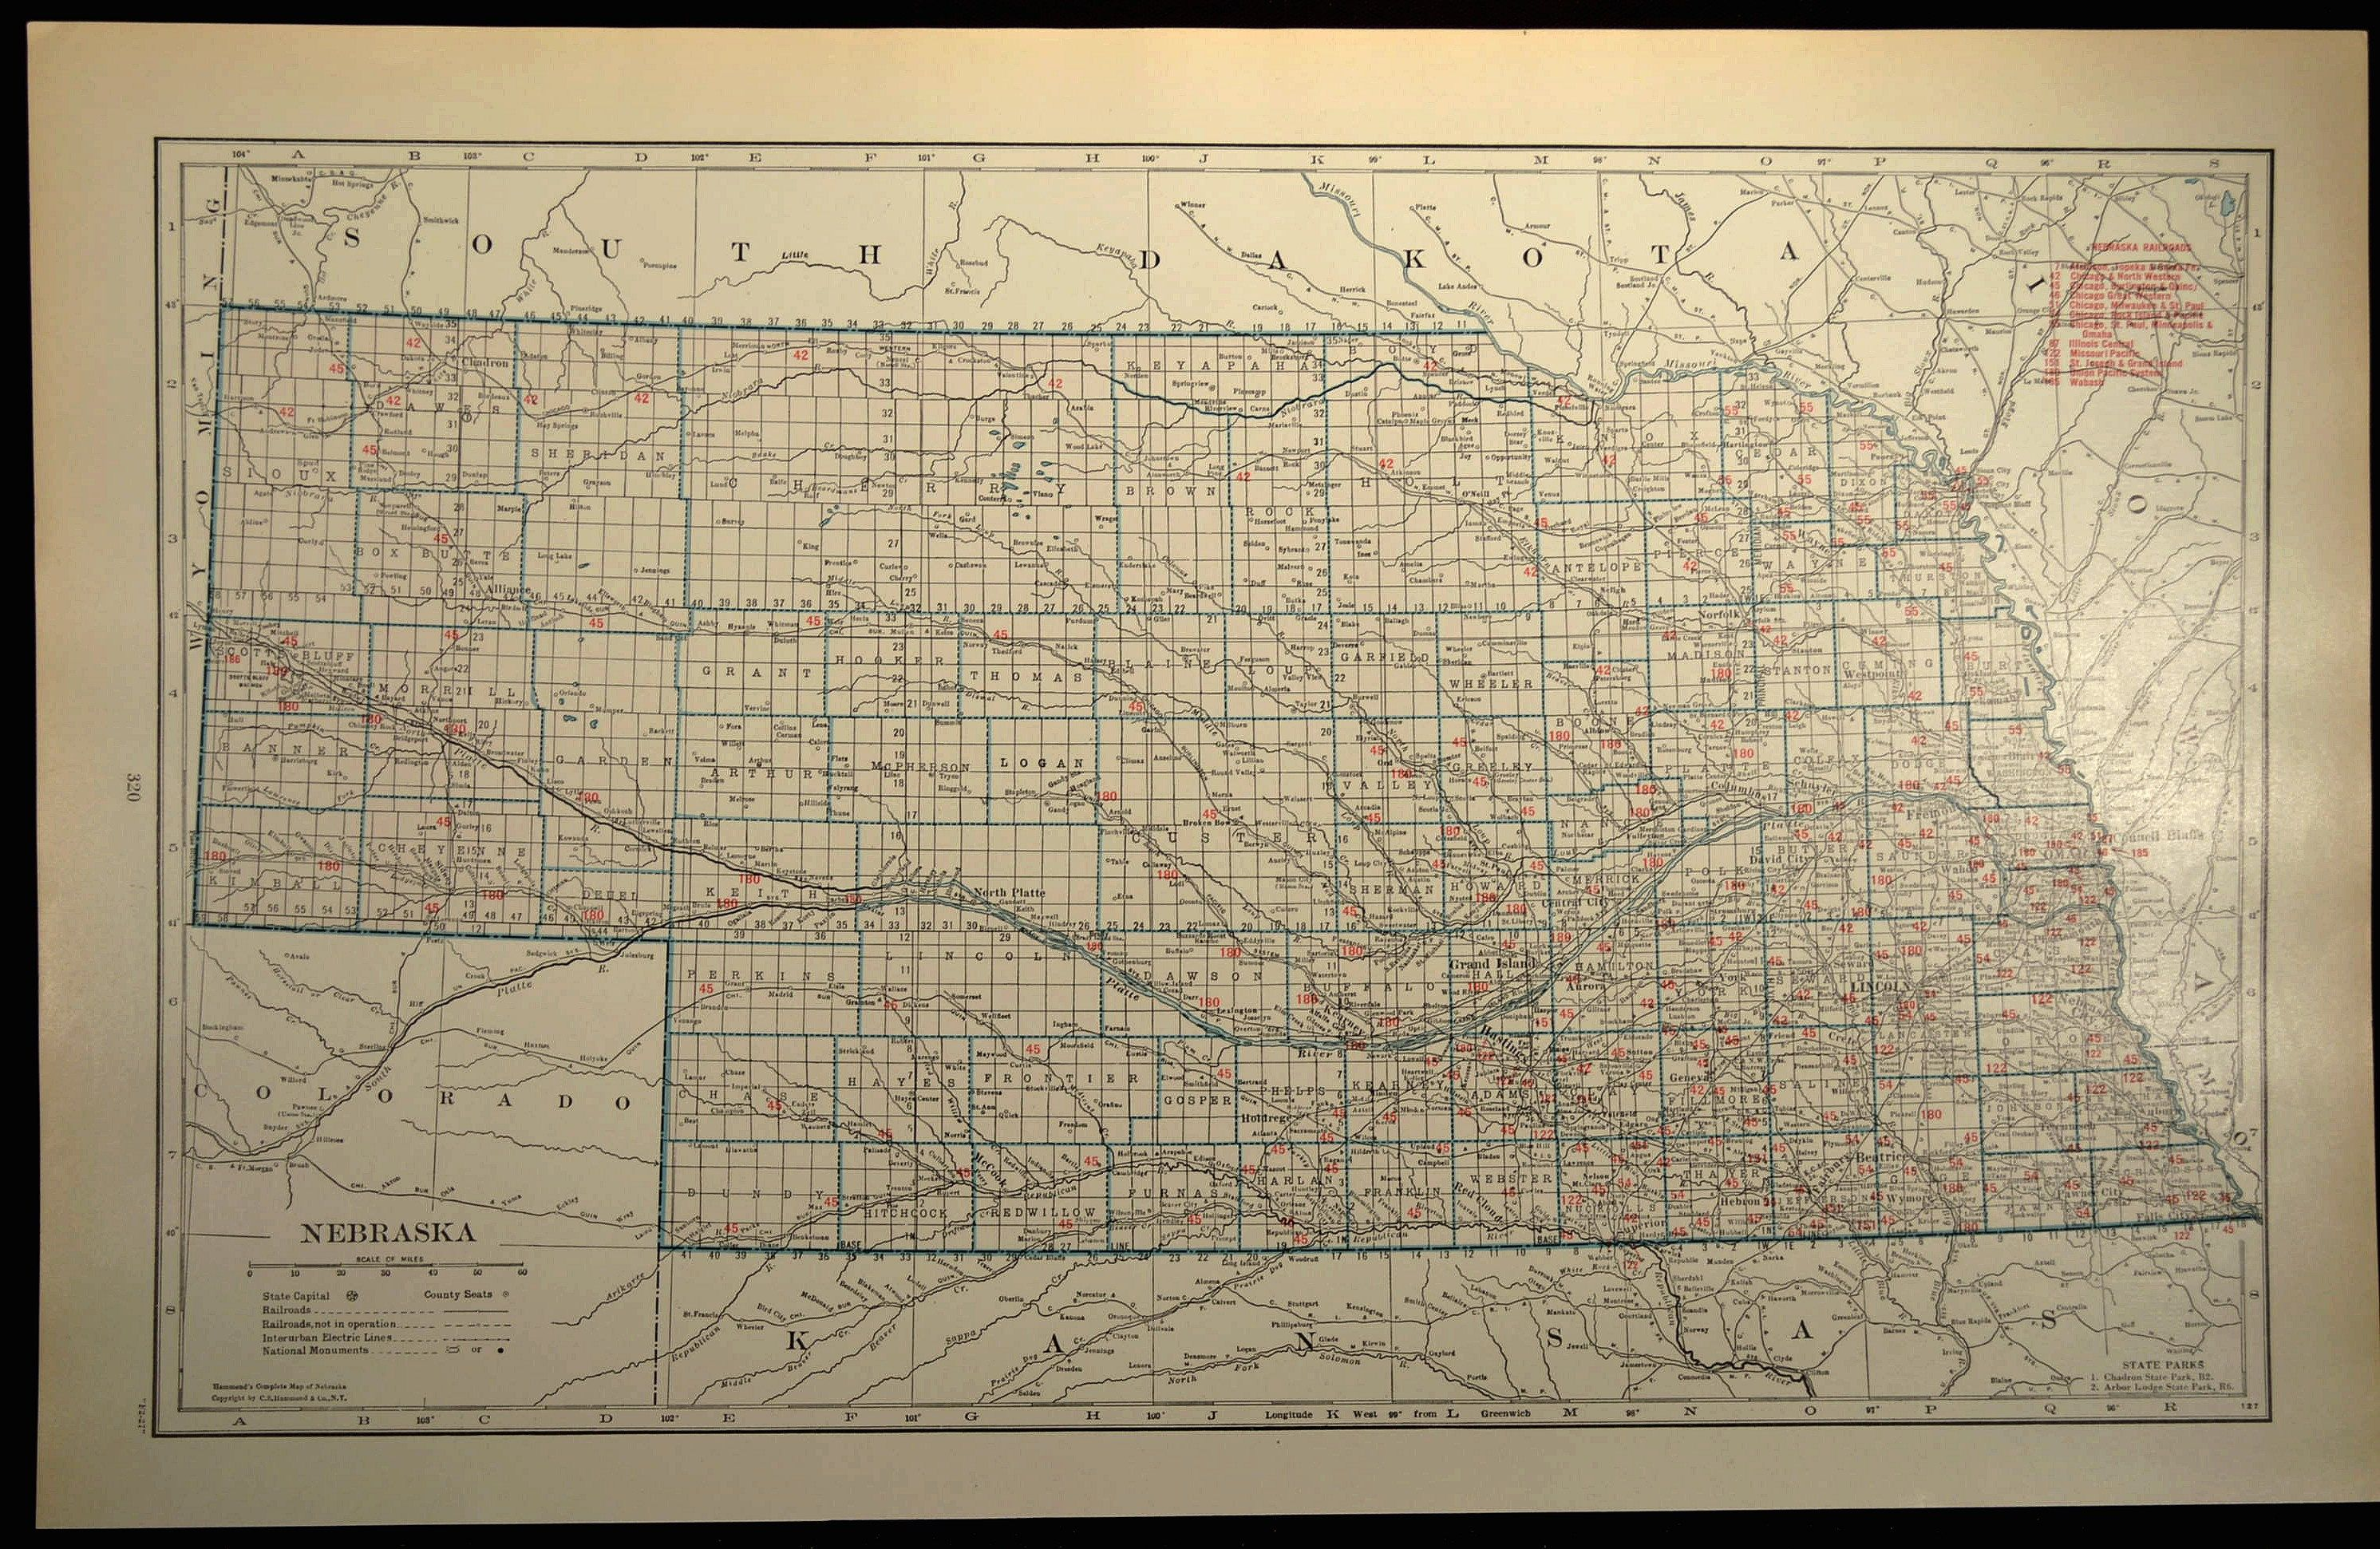 Nebraska Map Of Nebraska Wall Decor Art Railroad Map Large Etsy Architectural Prints Map Vintage Maps